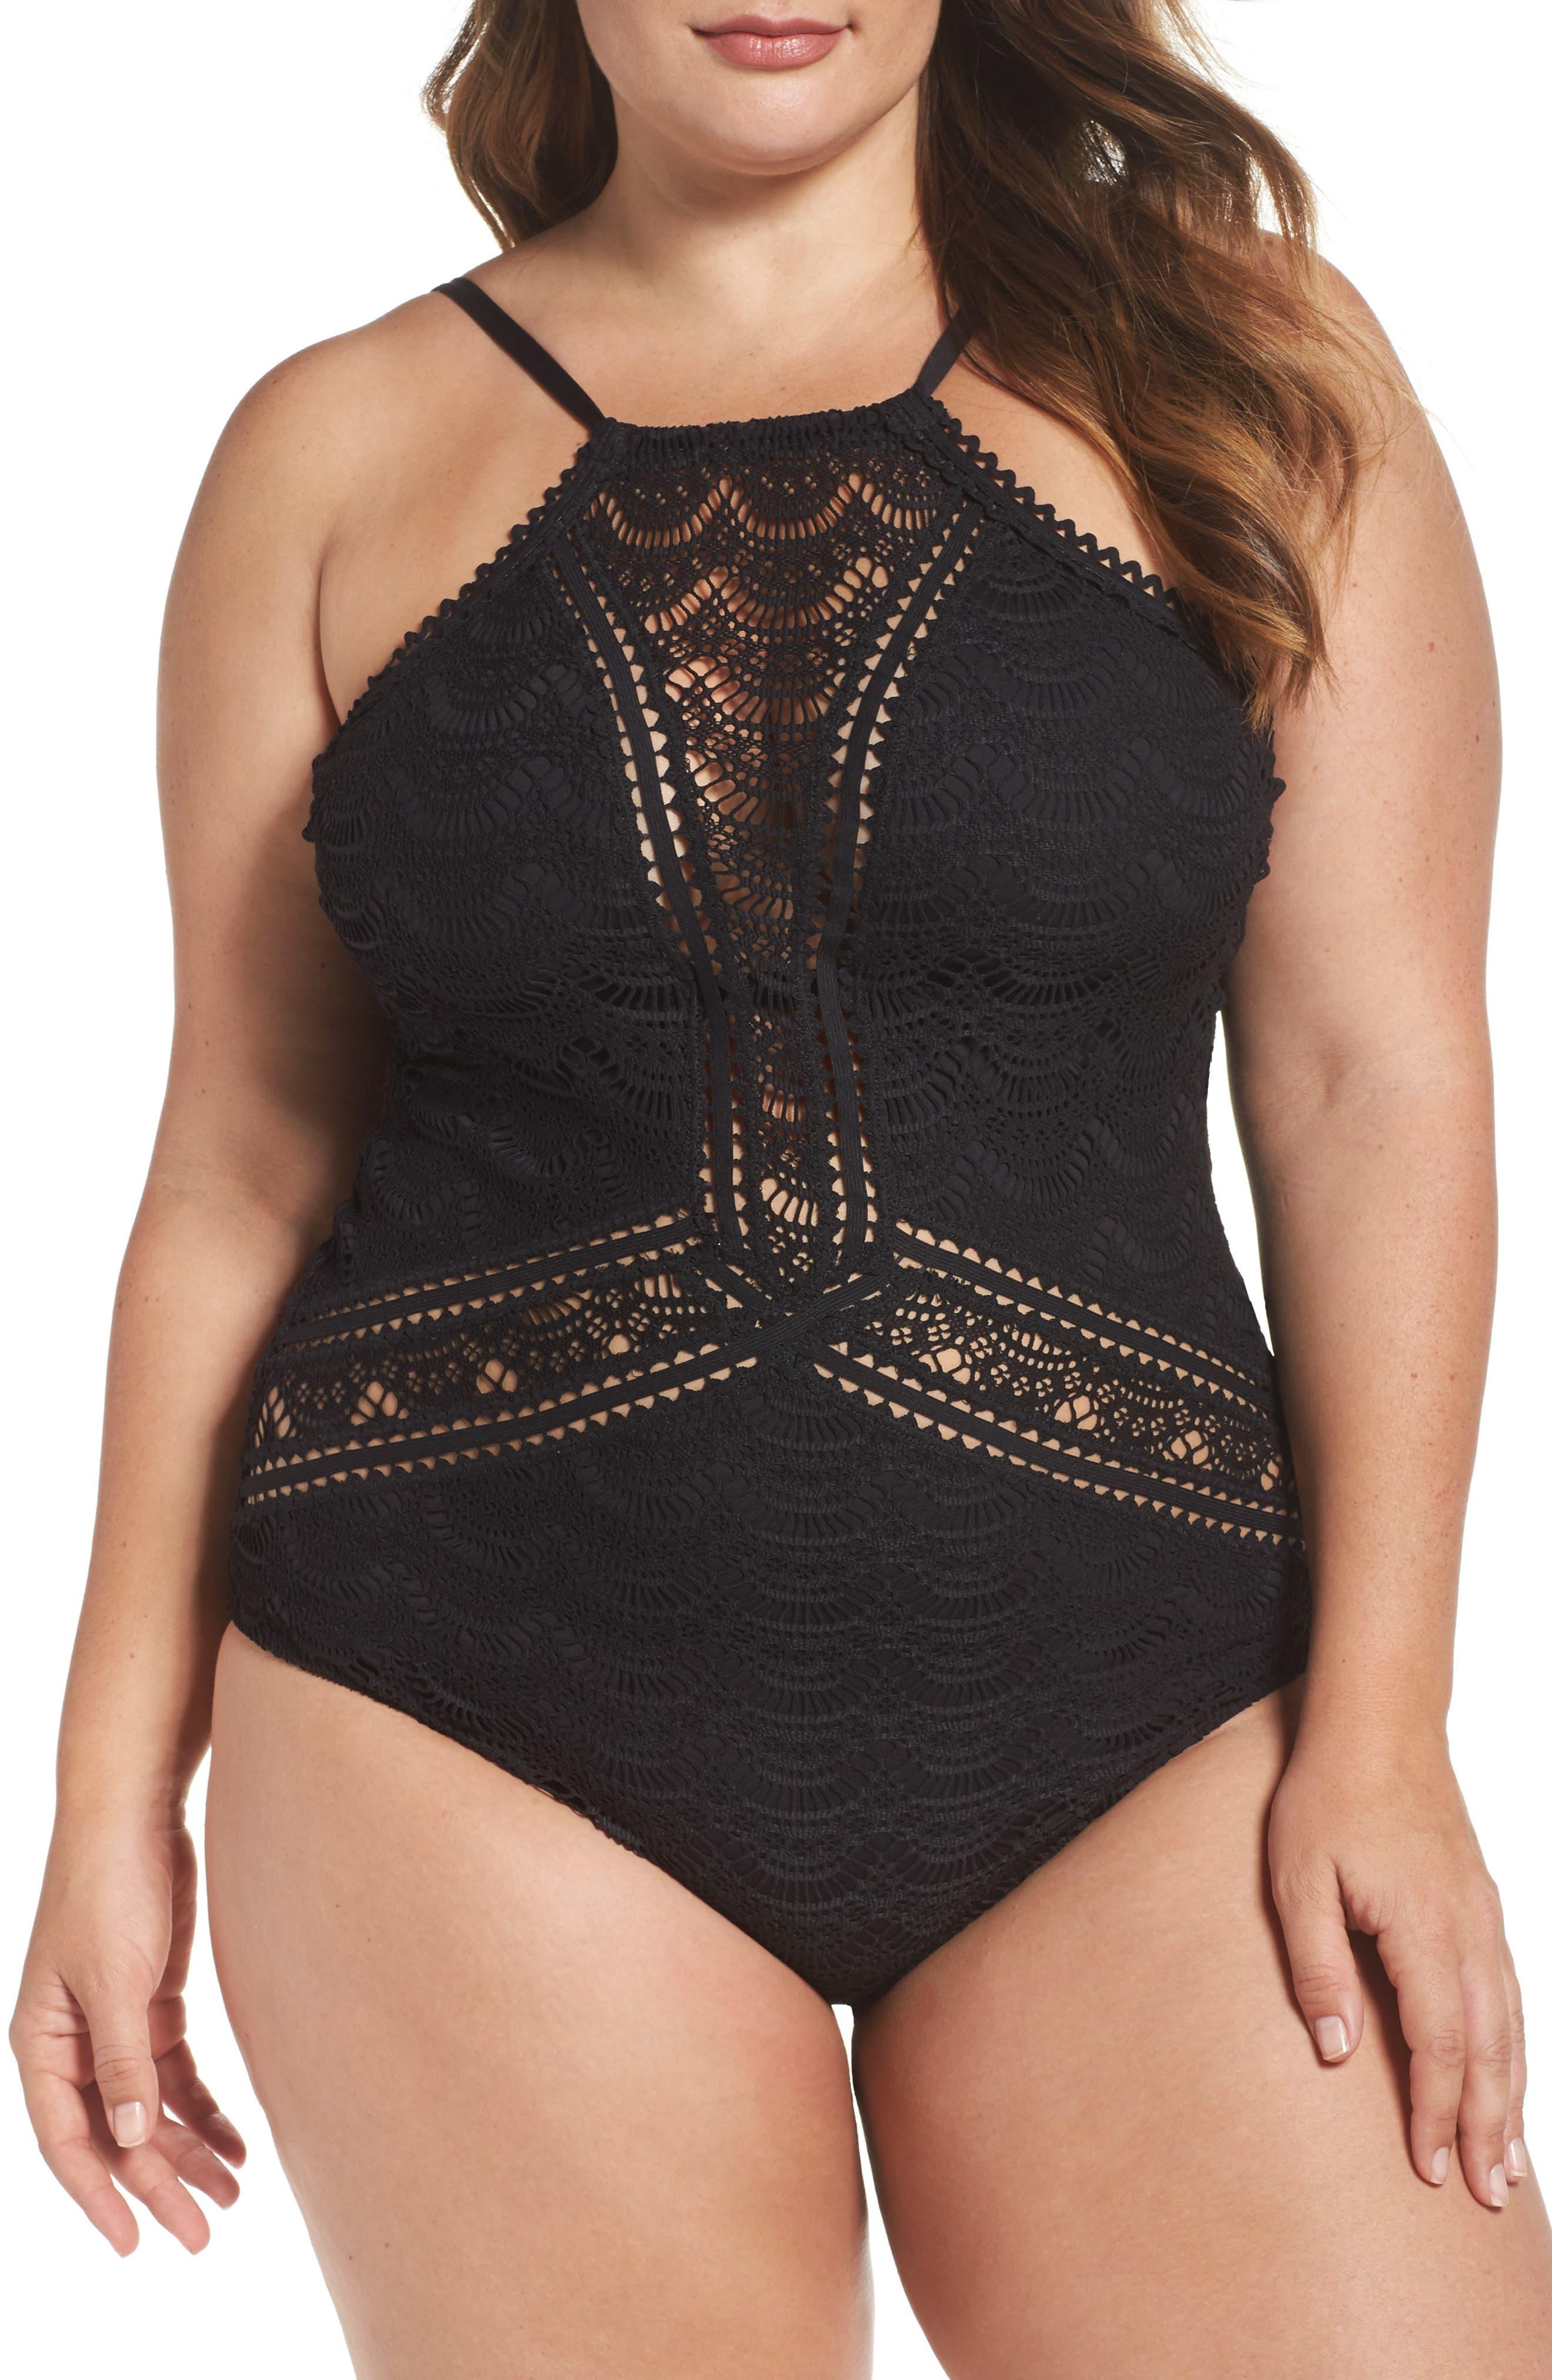 Alternate Image 1 Selected - Becca Etc. One-Piece Swimsuit (Plus Size)